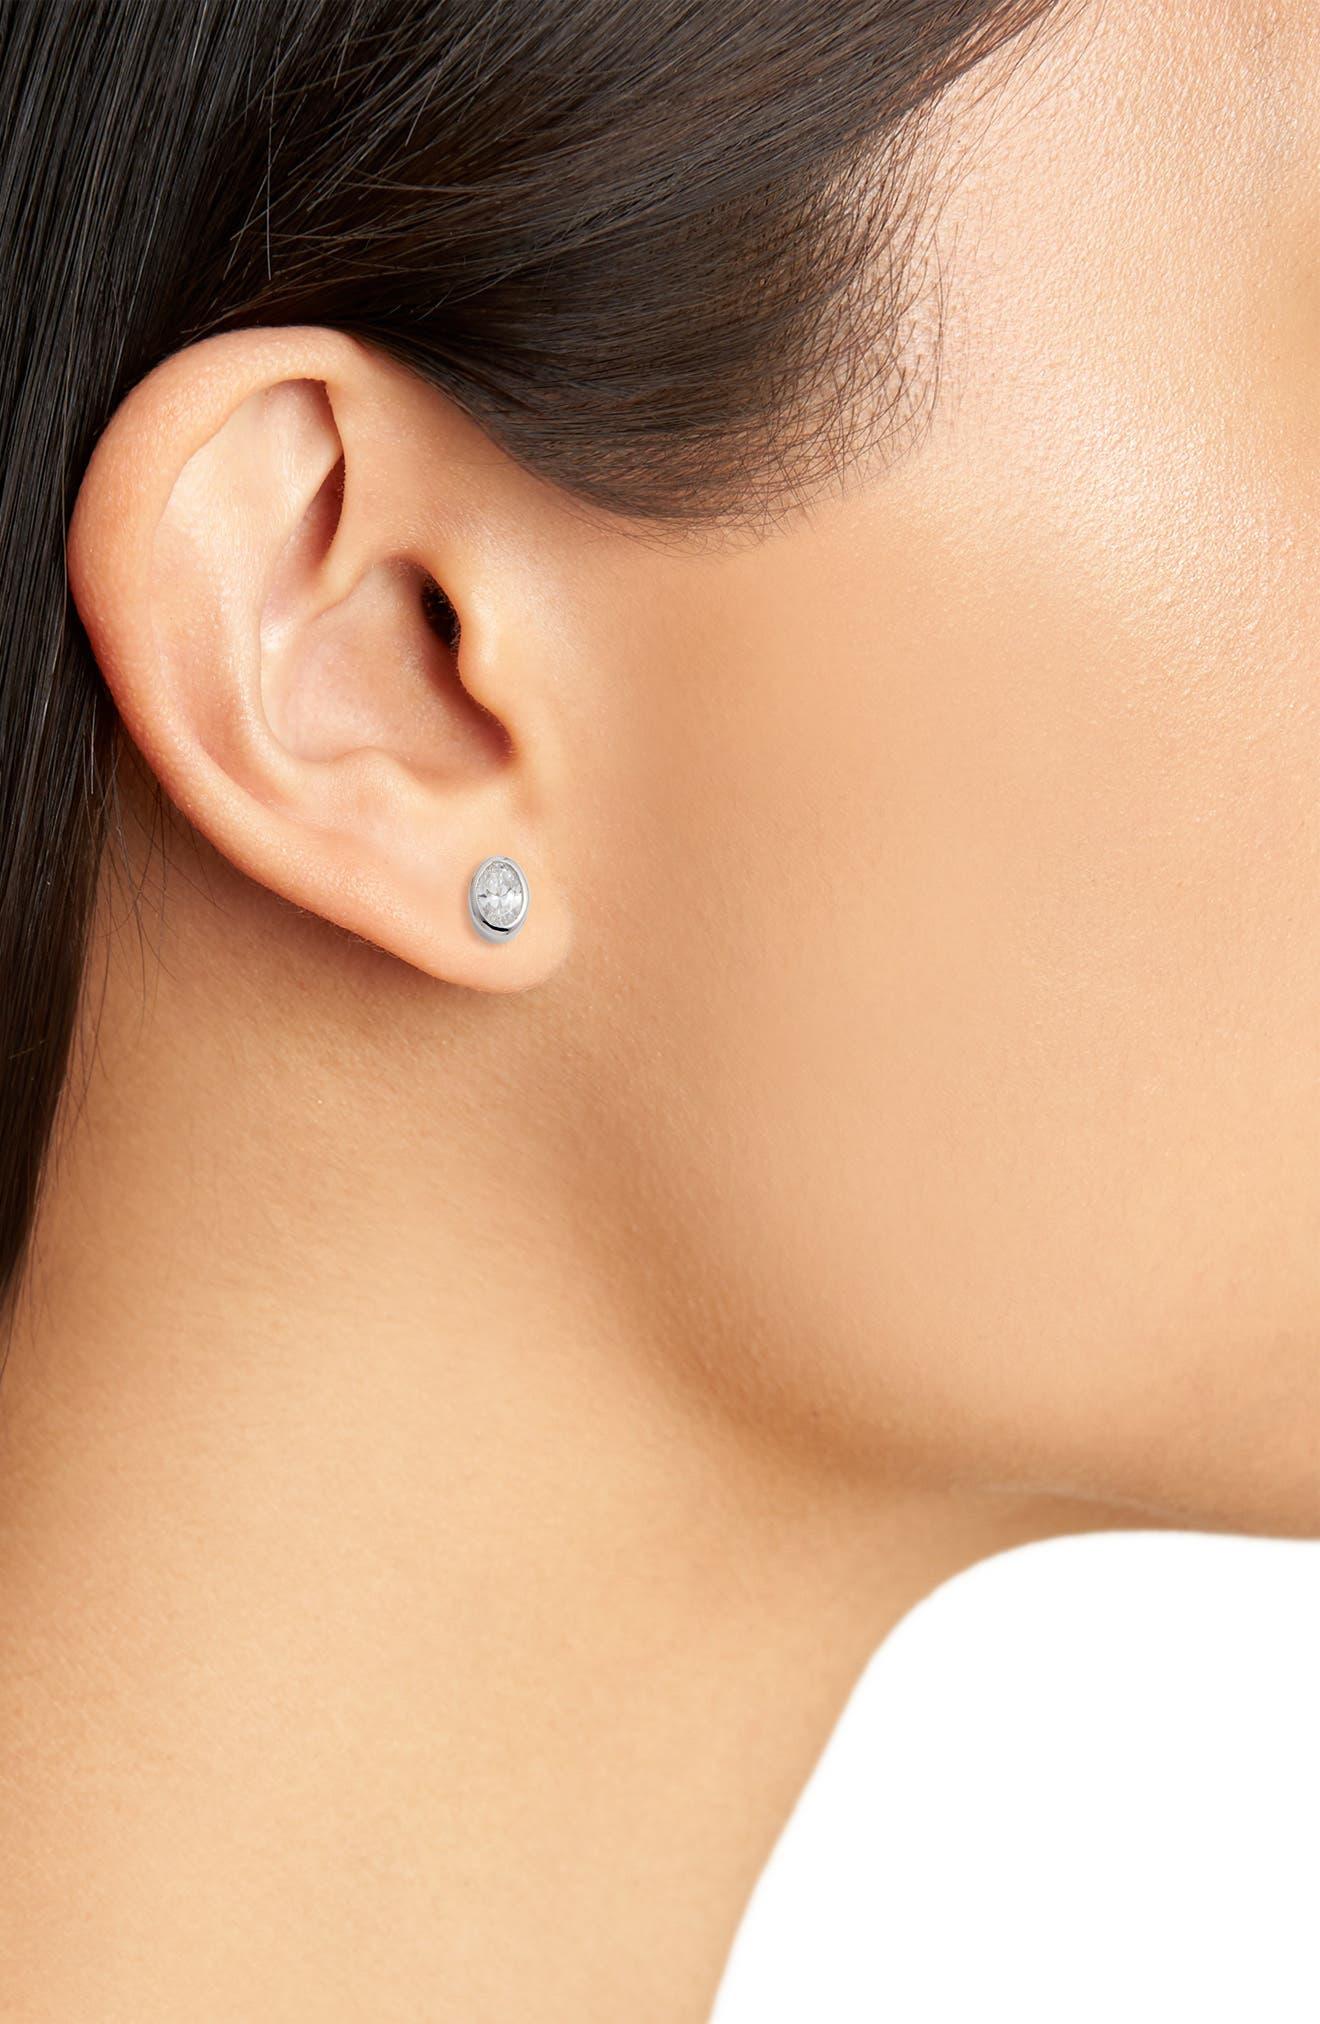 Bezel Set Oval Stud Earrings,                             Alternate thumbnail 2, color,                             SILVER/ CLEAR